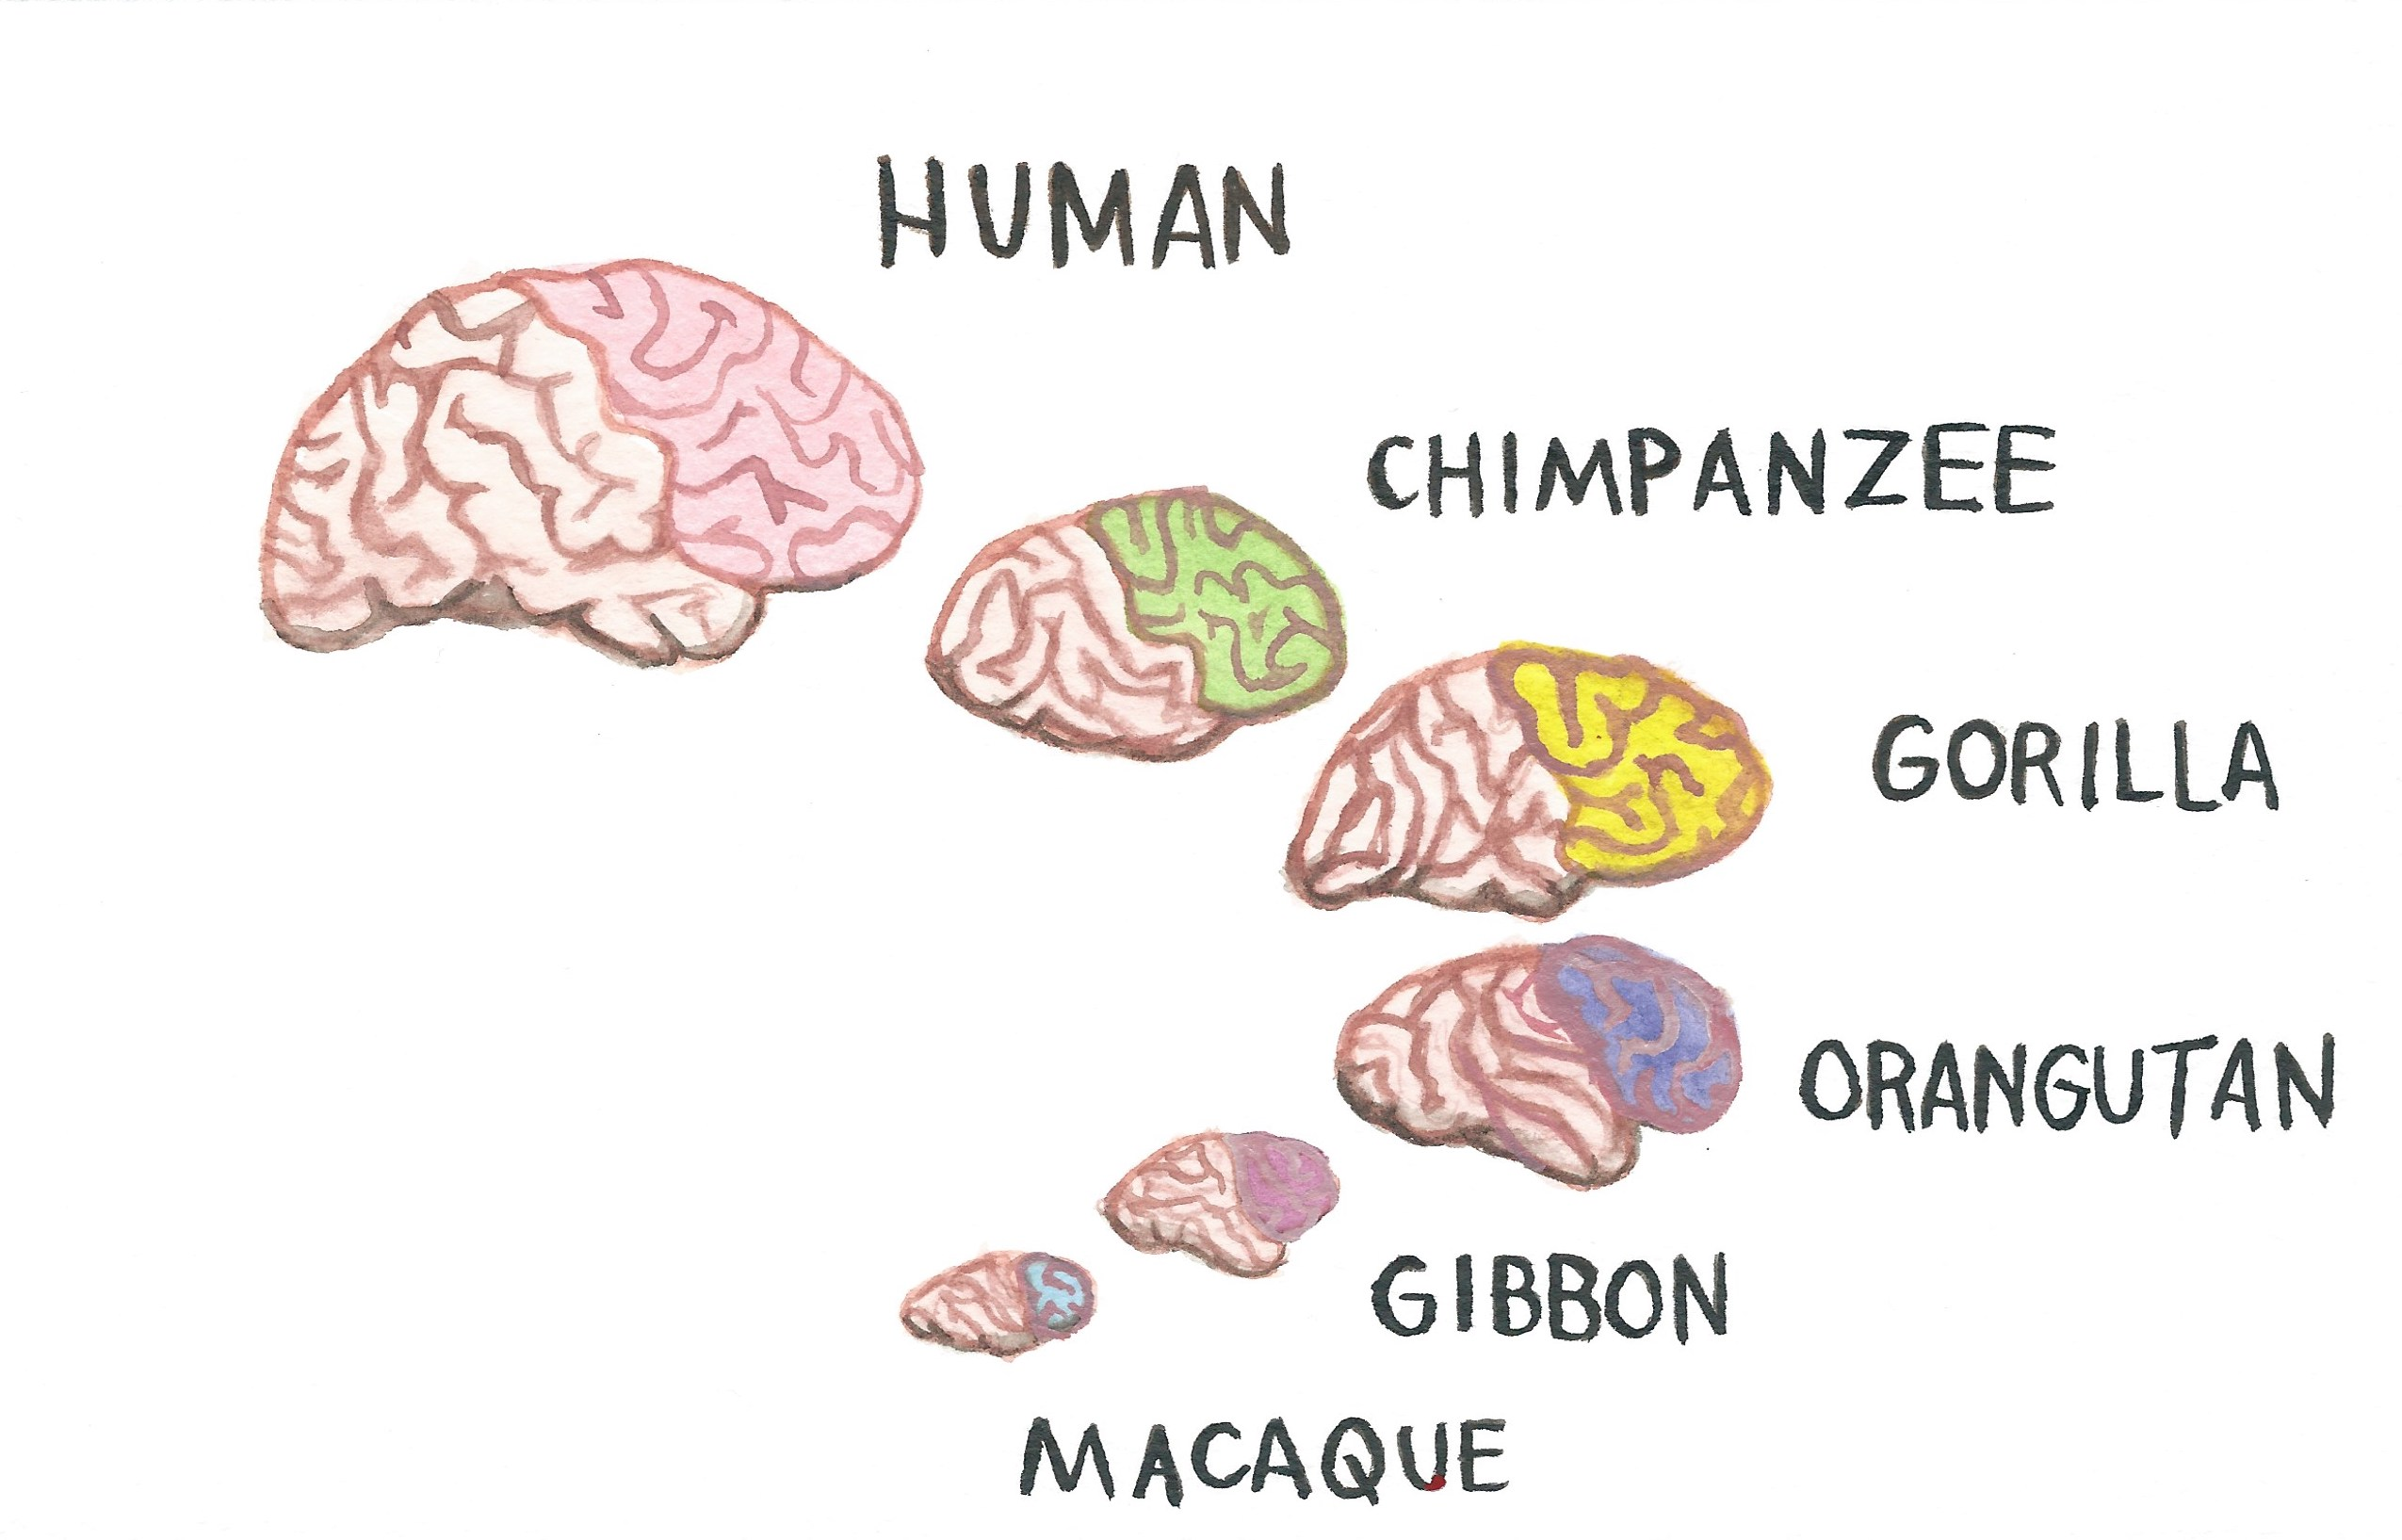 Frontal Lobes of Primate Species